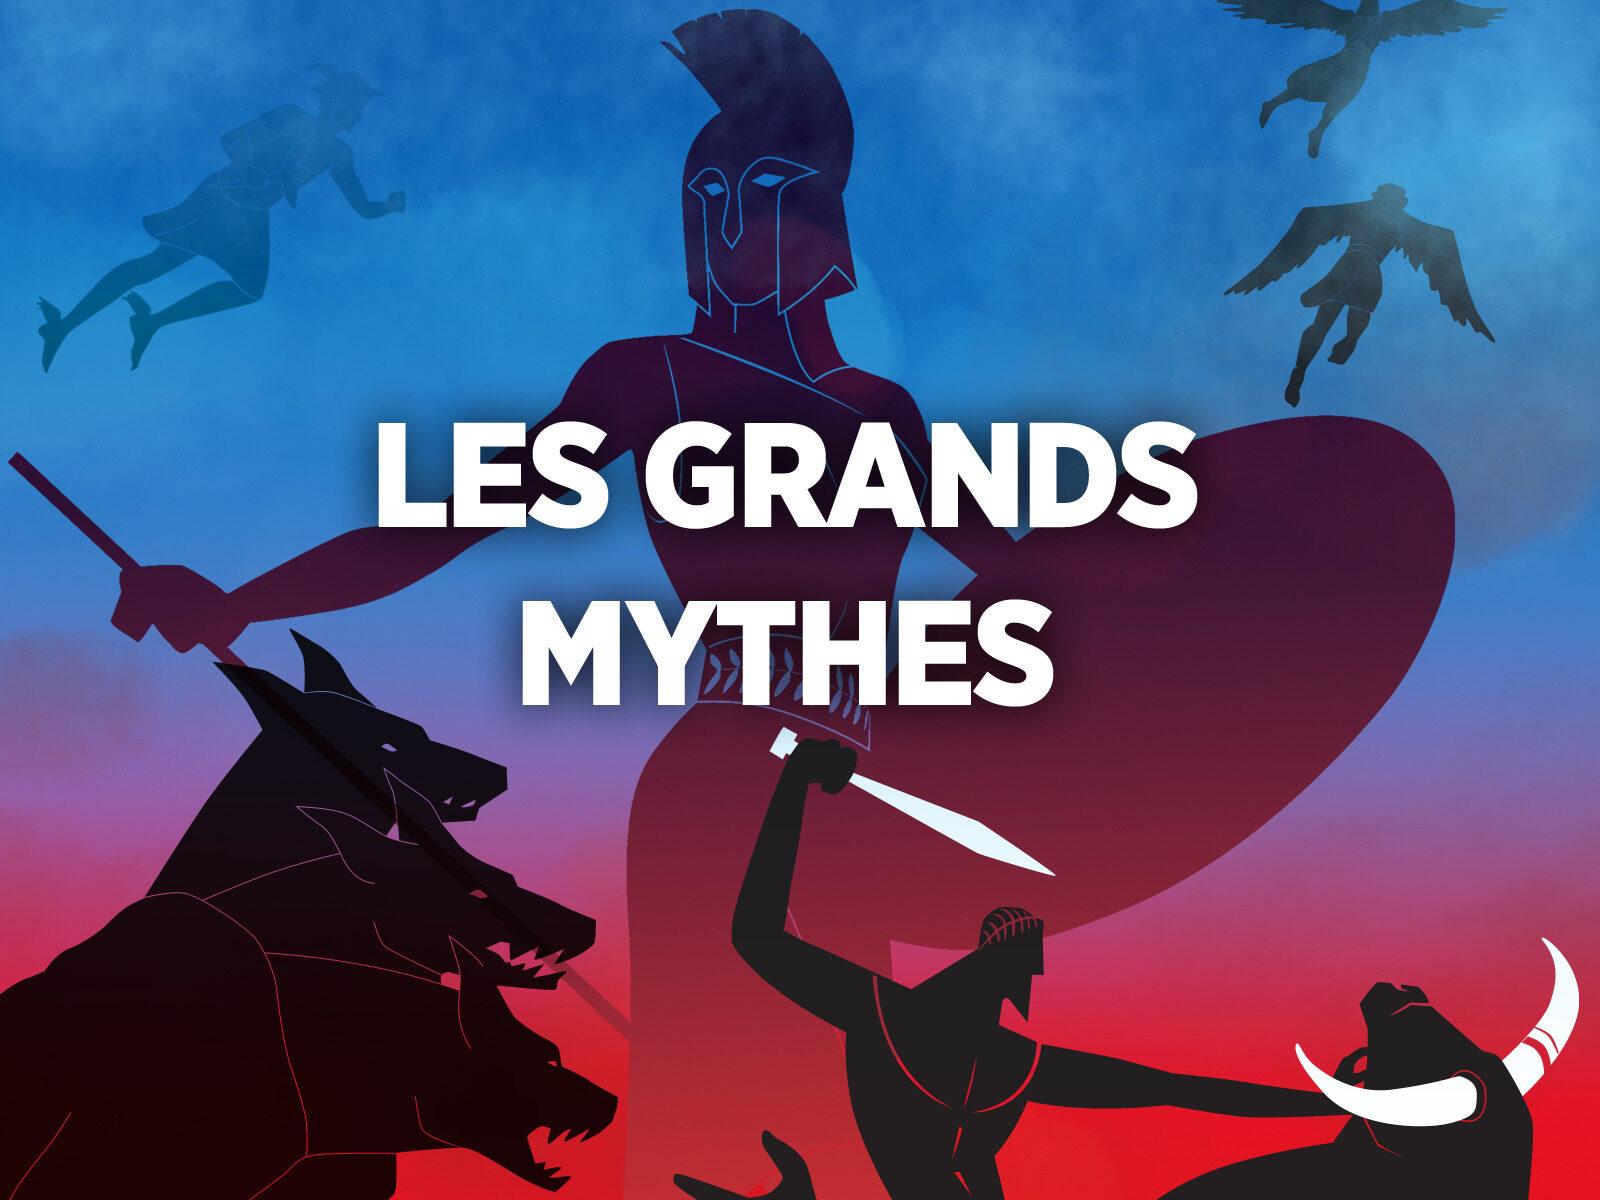 Arte Les grands mythes.jpg